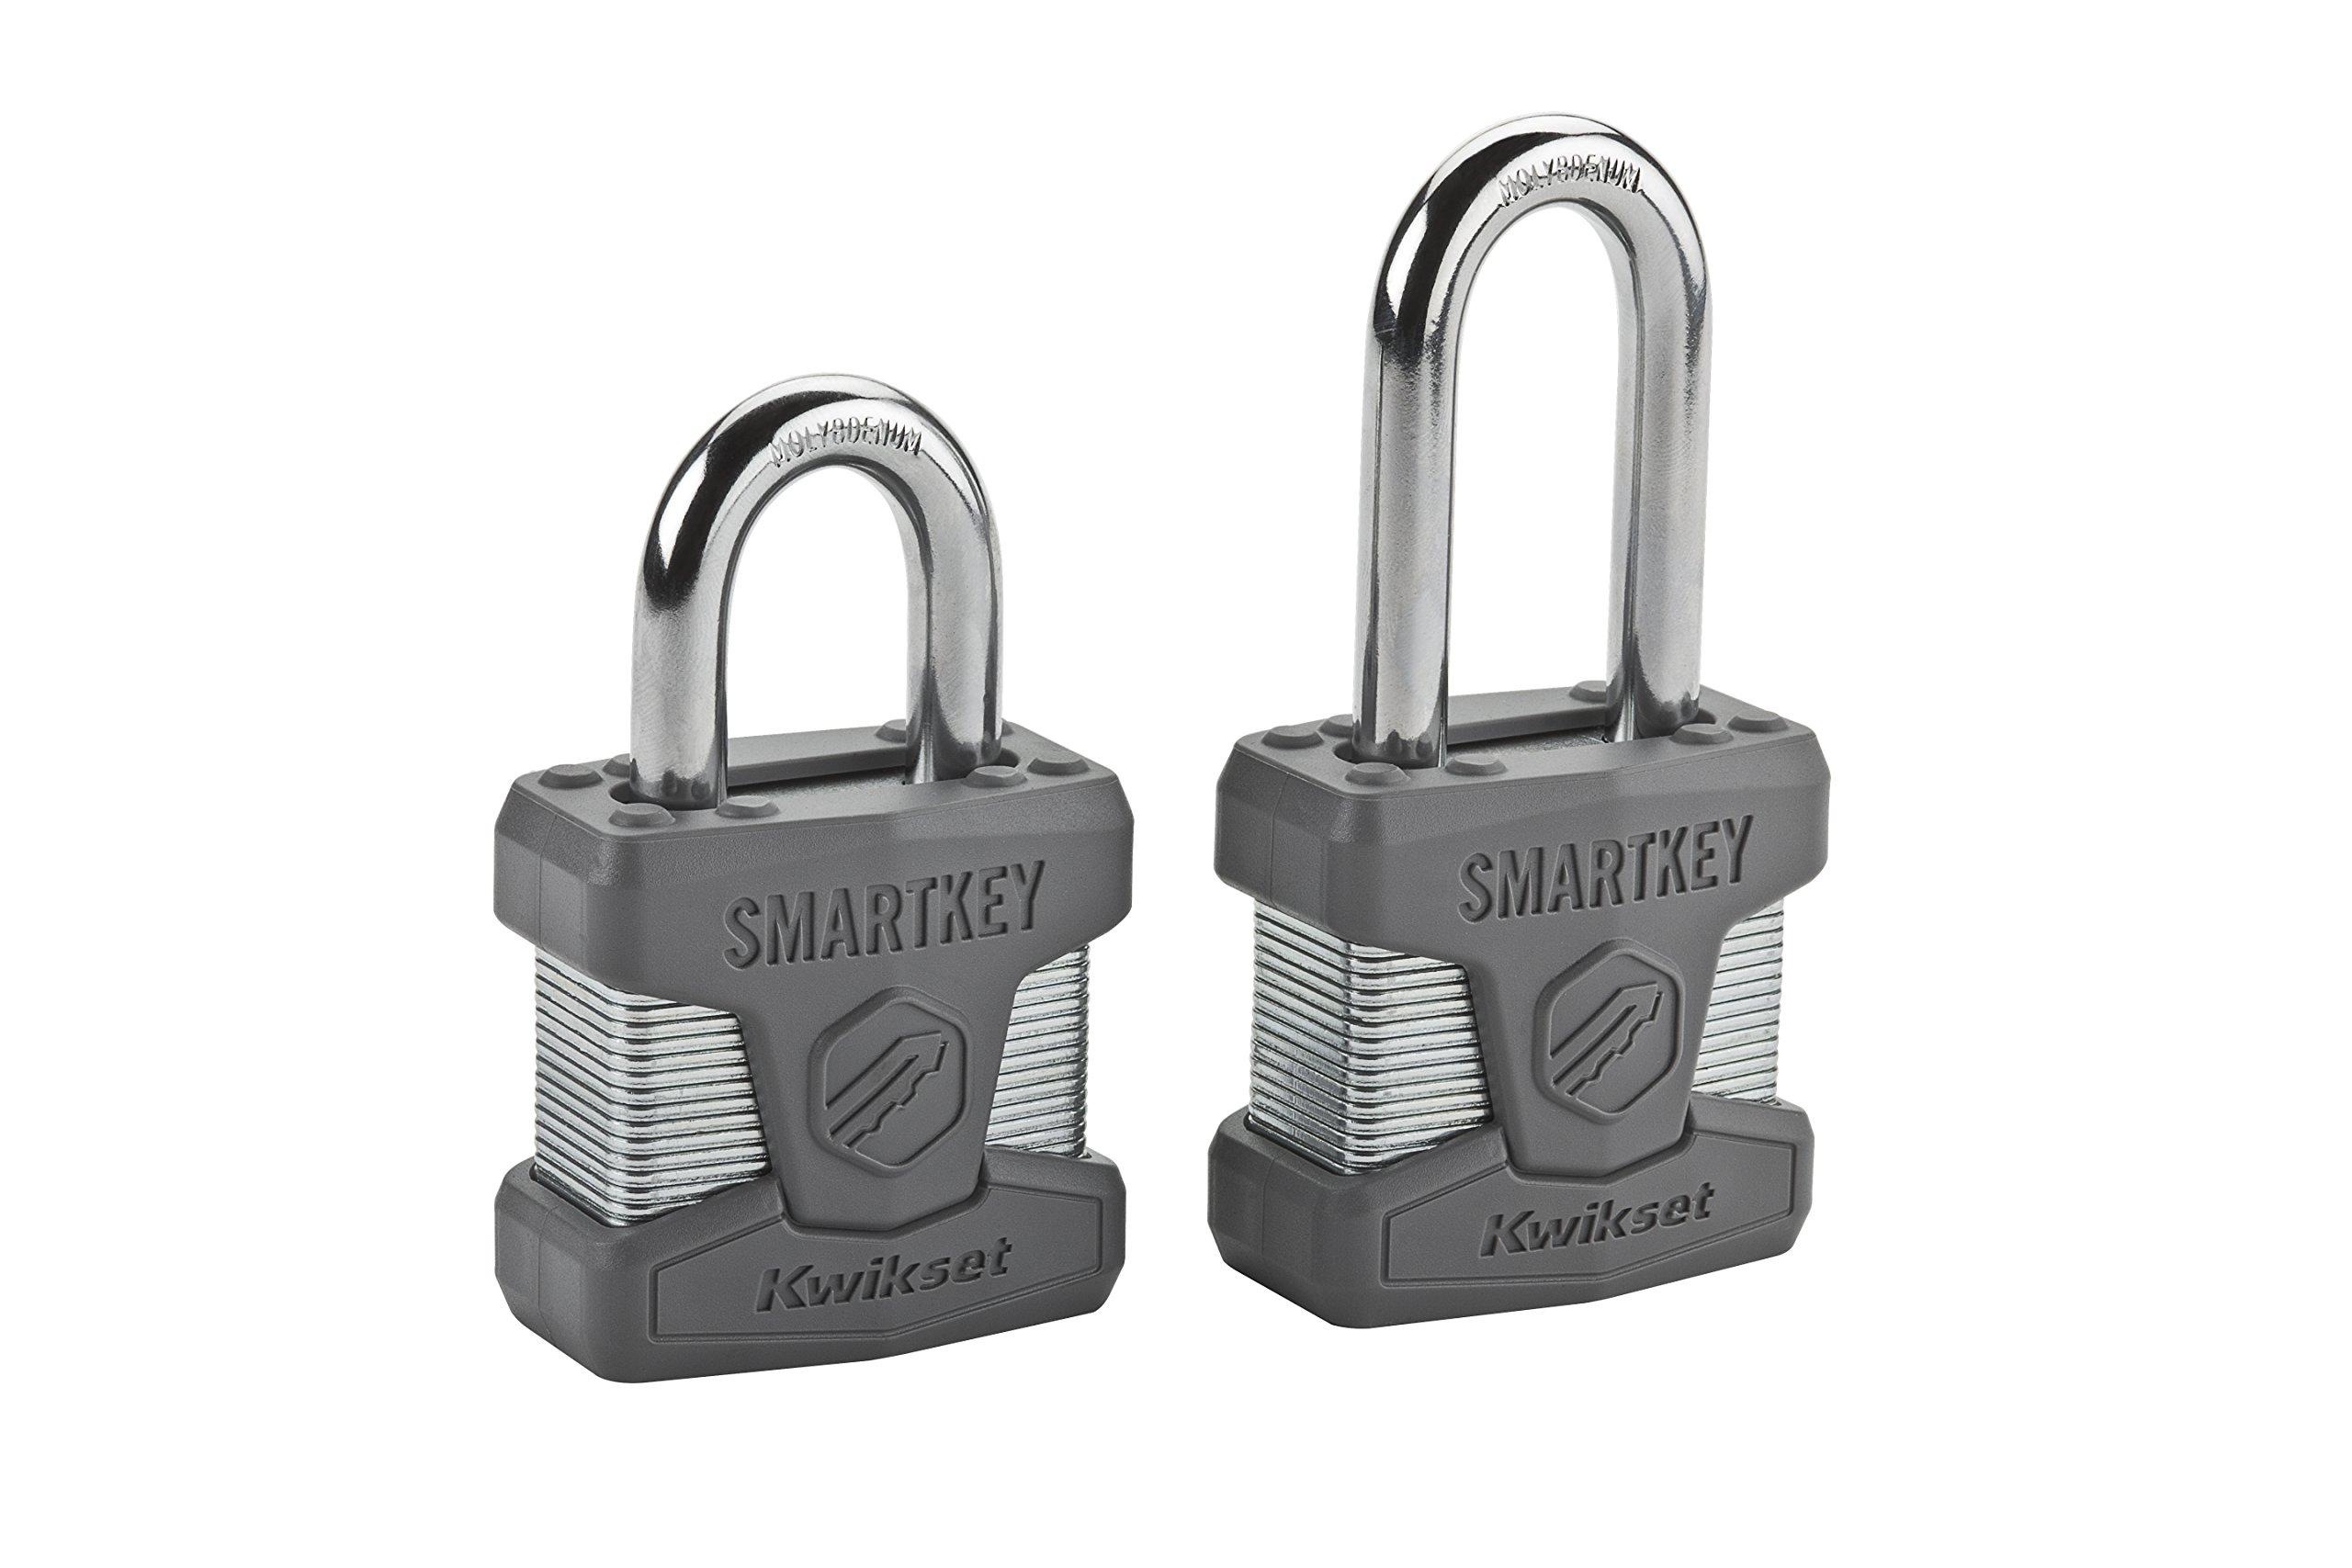 Kwikset 50MM SmartKey Padlock Standard Shackle in Satin Chrome by Kwikset (Image #2)